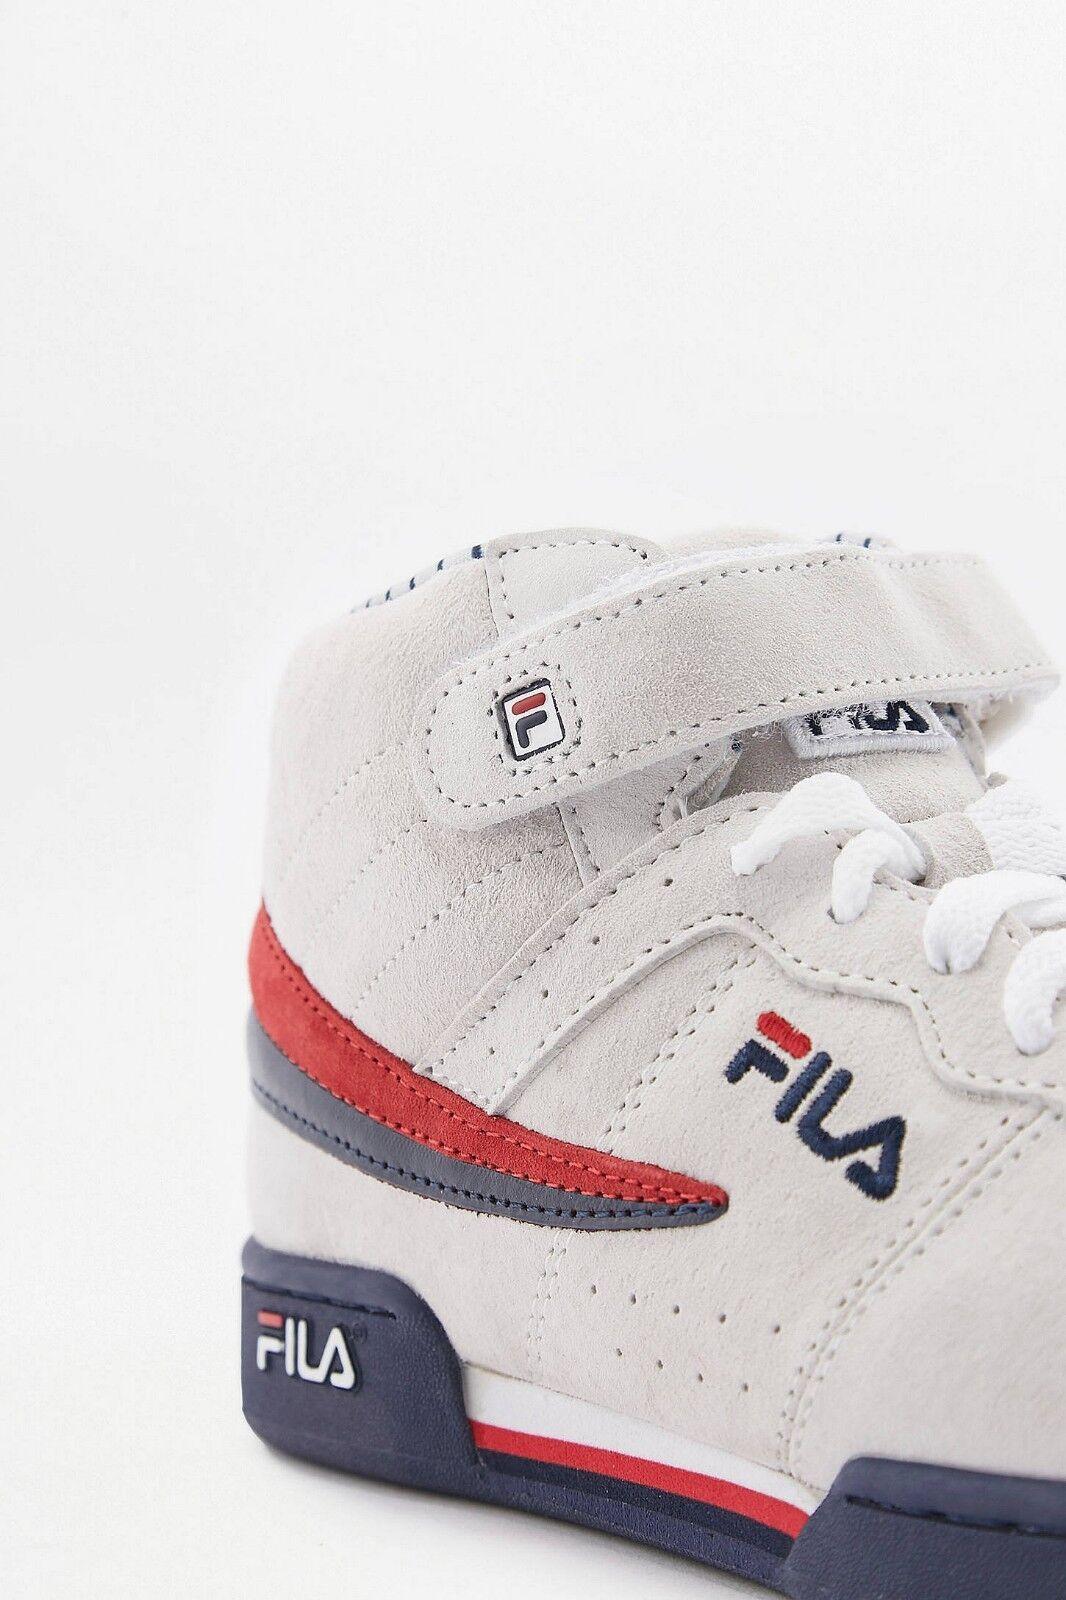 fila basketball zapatillas uk